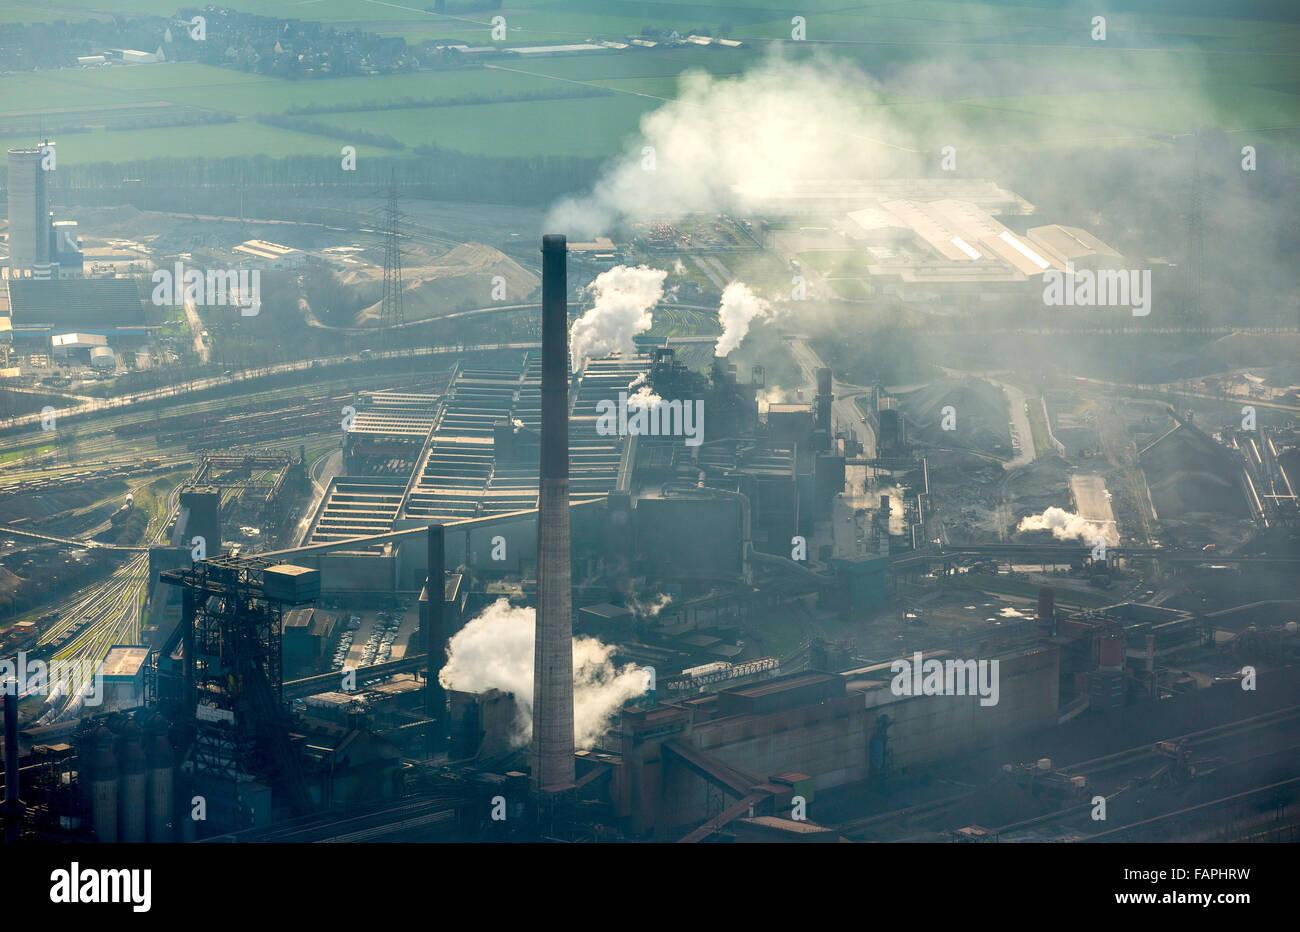 Aerial view, steelworks HKM am Rhein, steelworks Krupp-Mannesmann, Huckingen, smoking chimneys, coking, industrial - Stock Image